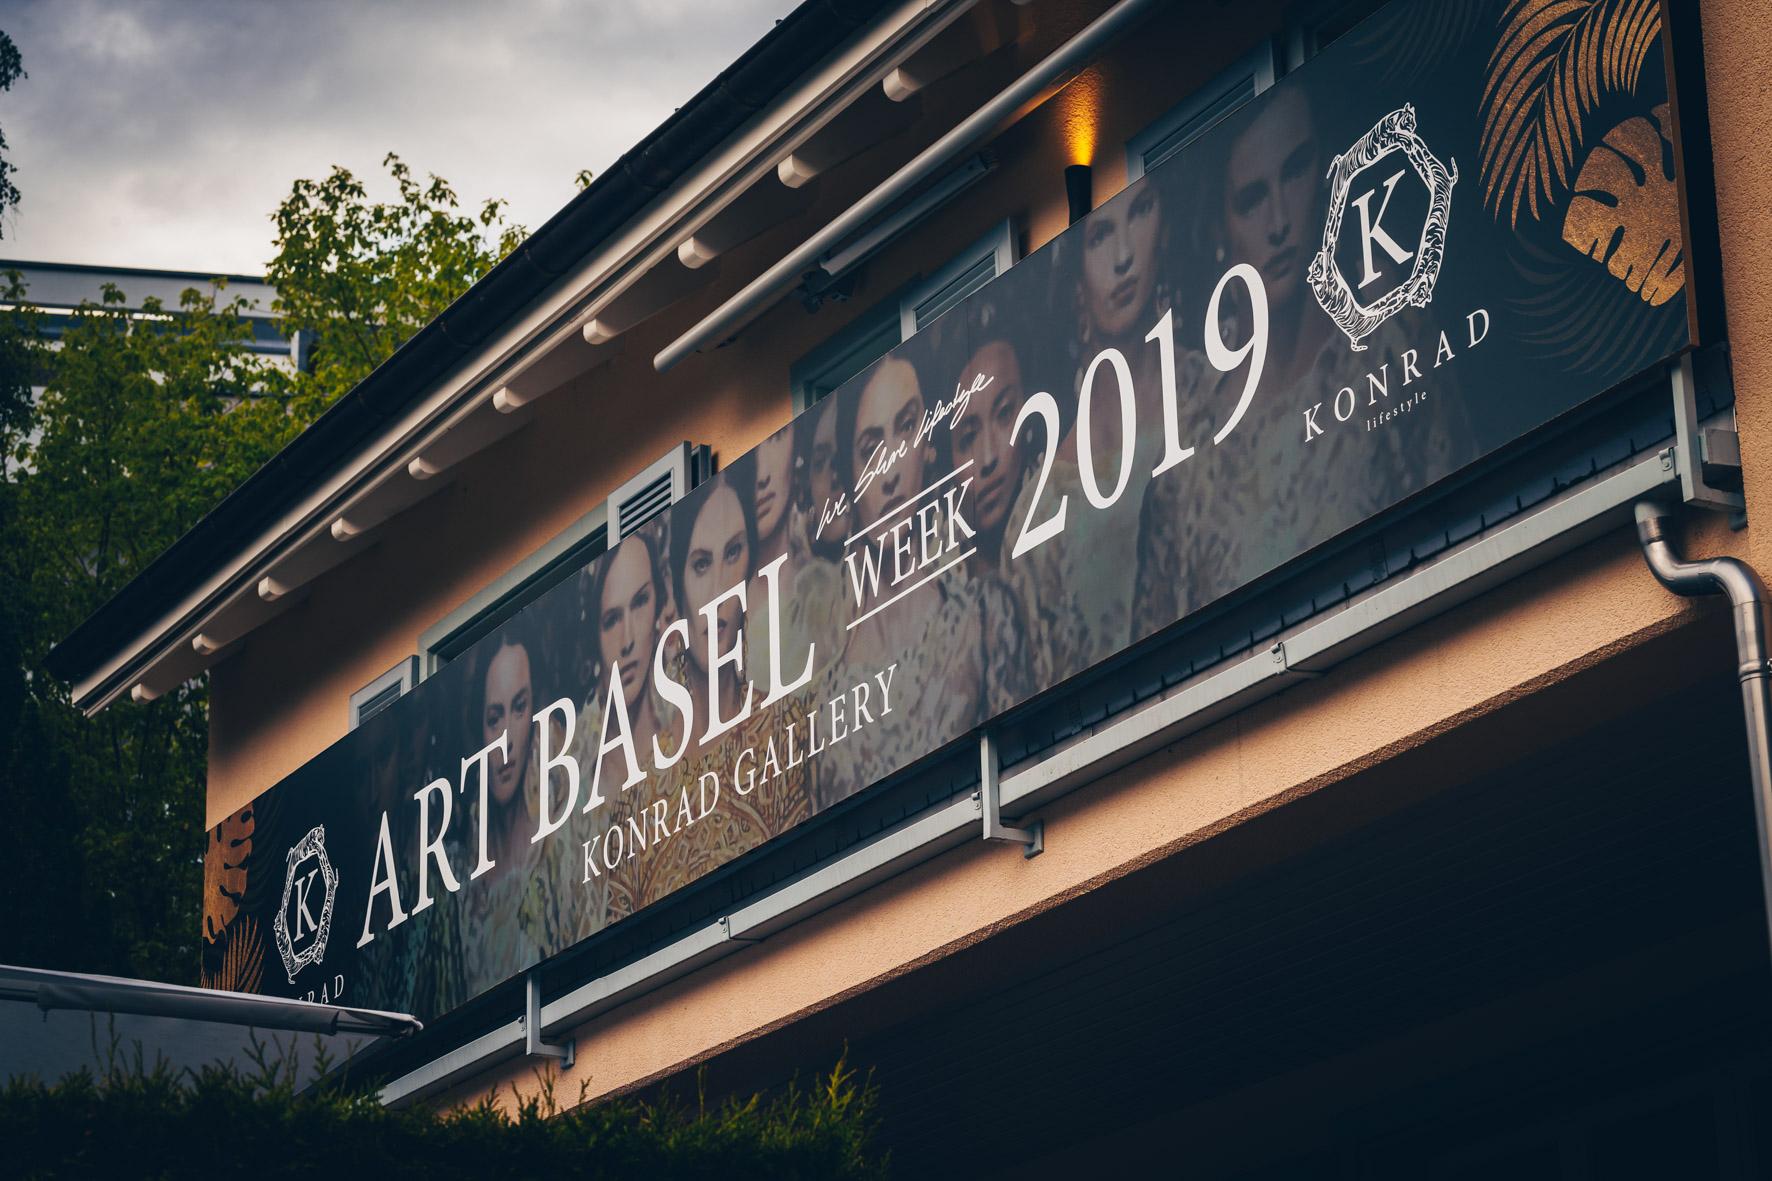 Konrad-lifestyle-art-basel-%22rollsroyce%22-2019-81.jpg